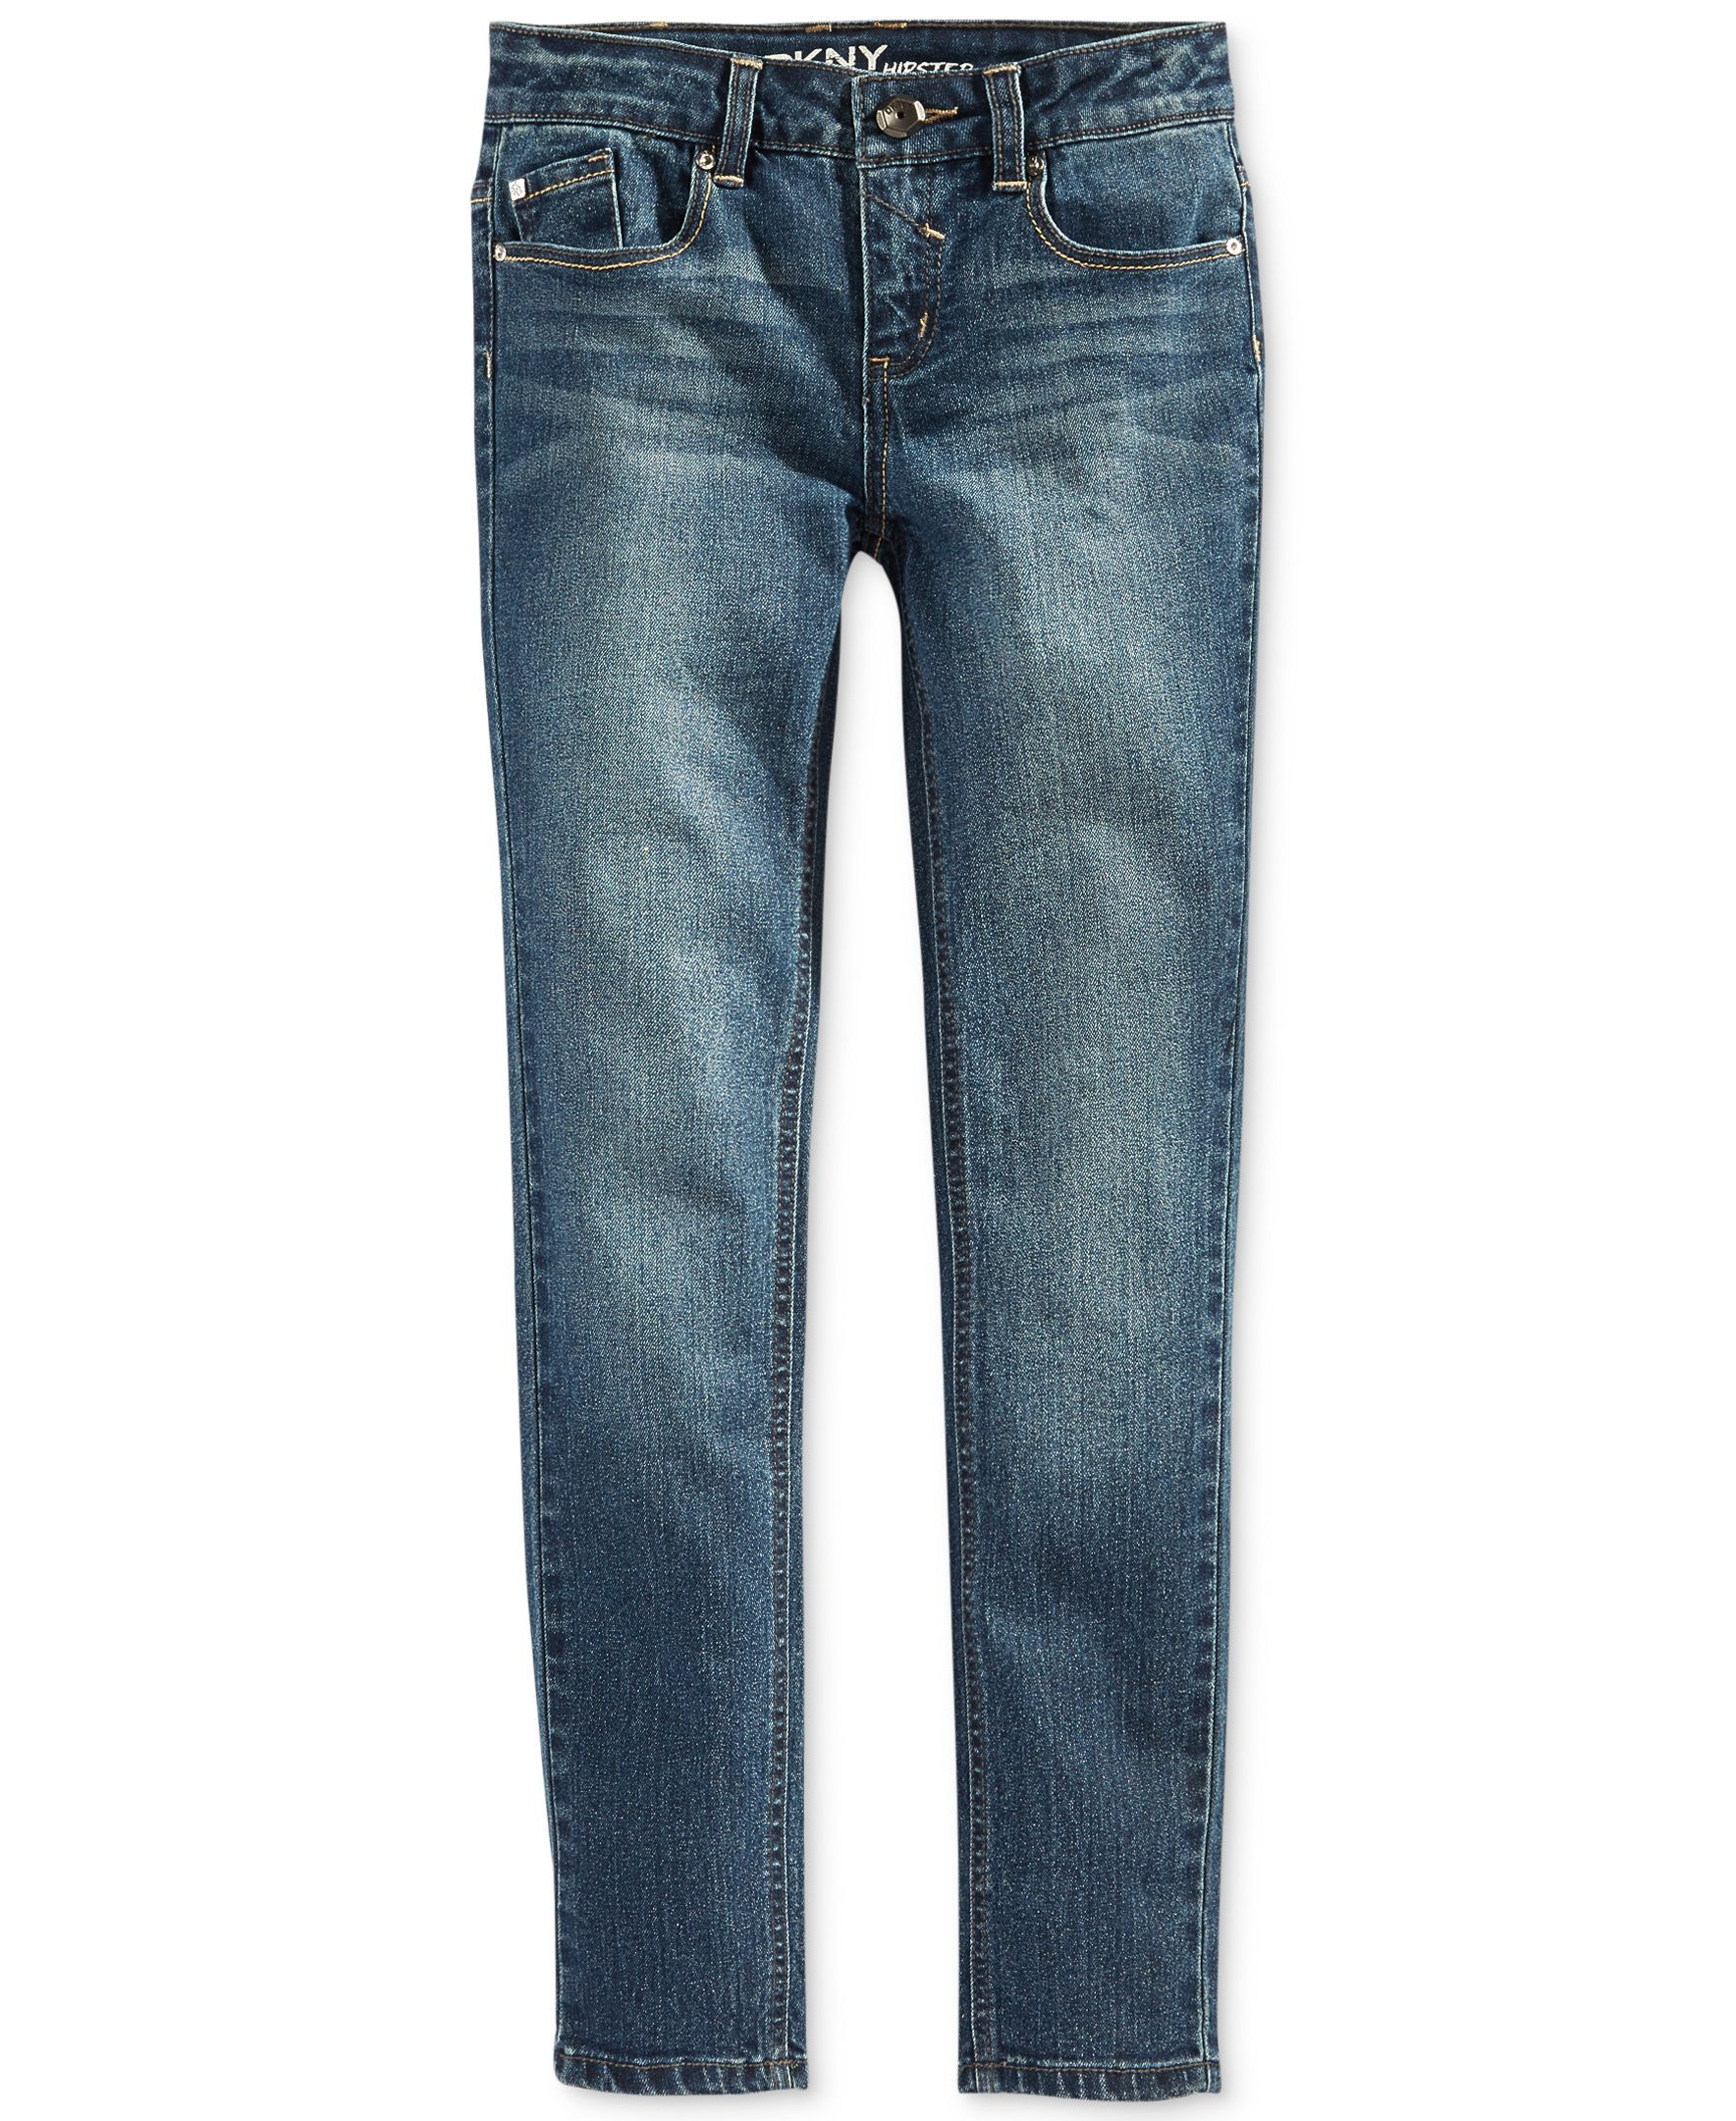 DKNY Girls Denim Pants